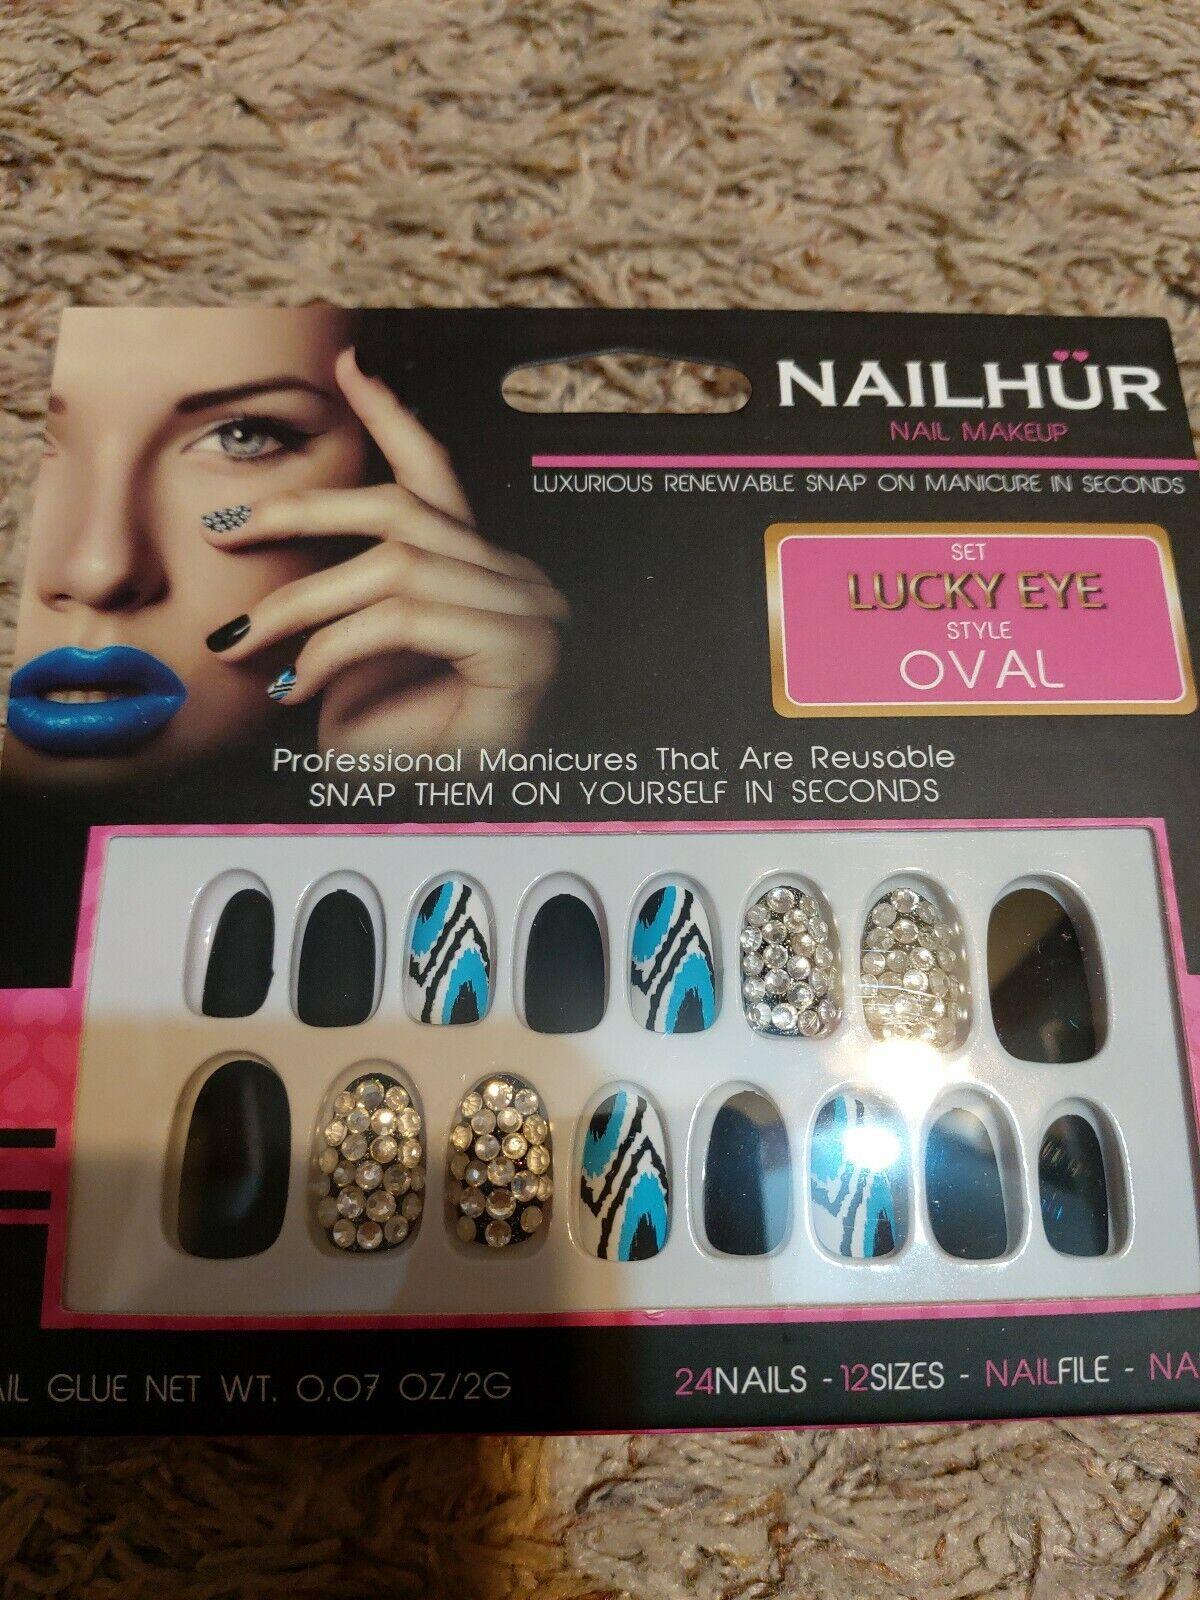 Nailhur Reviews : nailhur, reviews, Nailhur, Makeup, Lucky, Style, Manicure